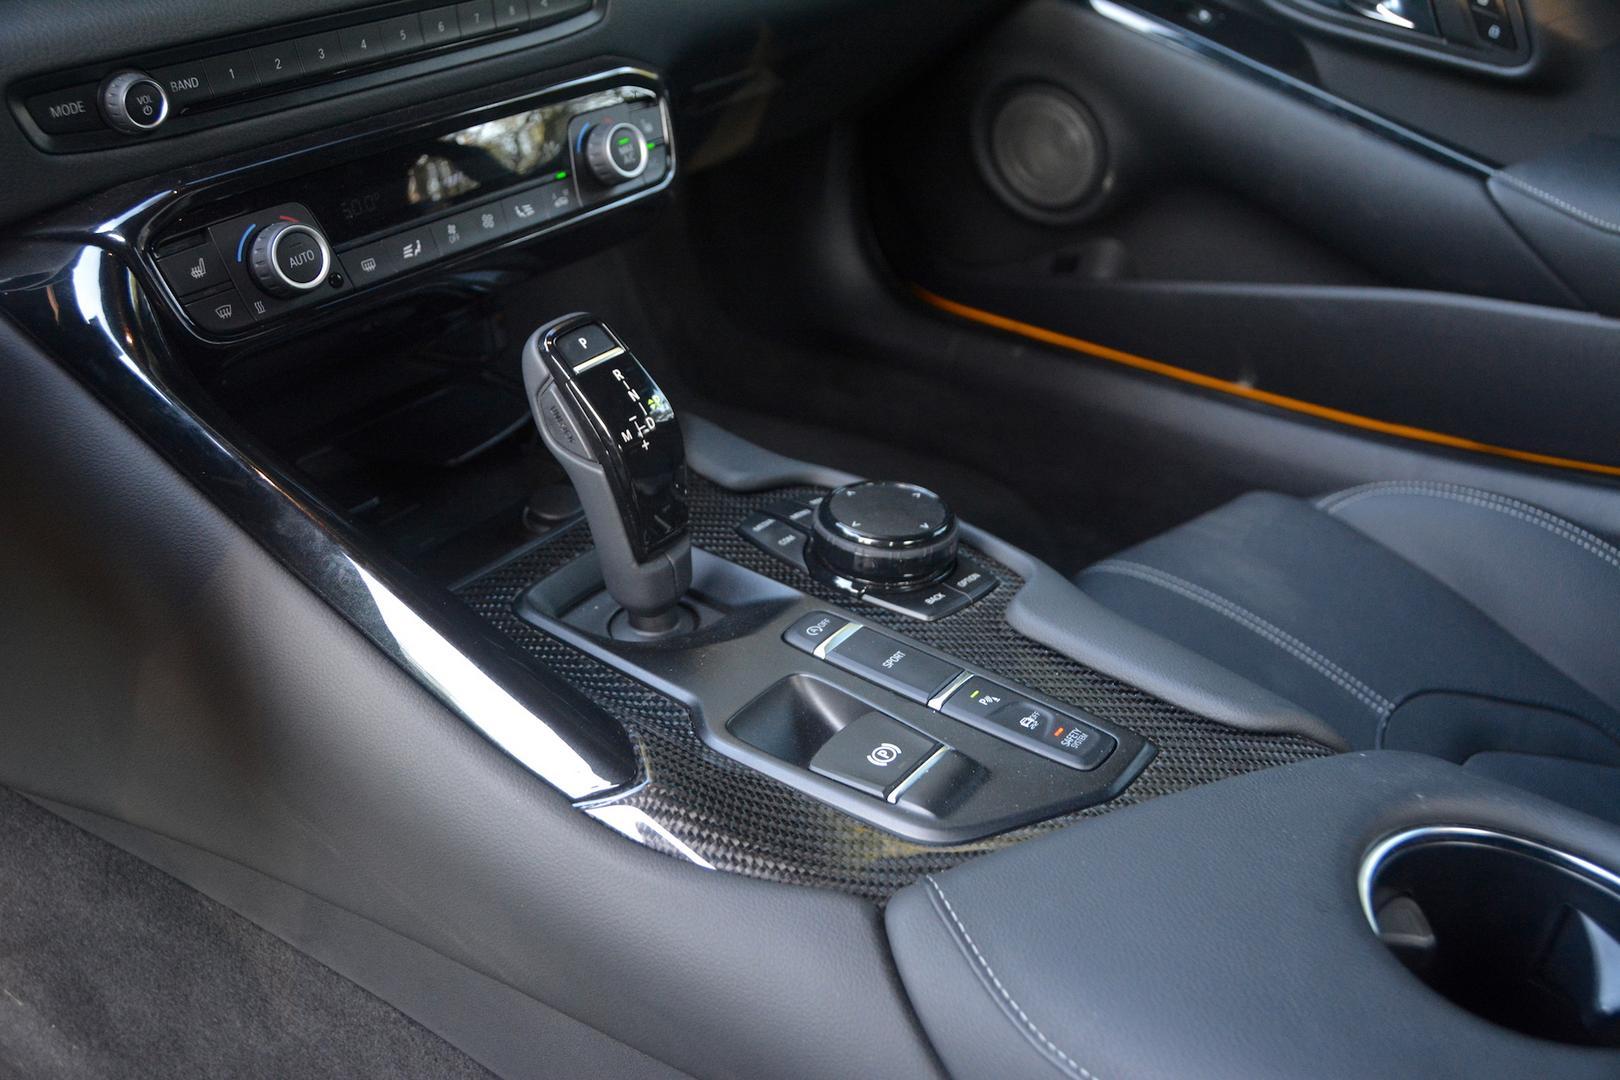 Toyota GR Supra gear lever